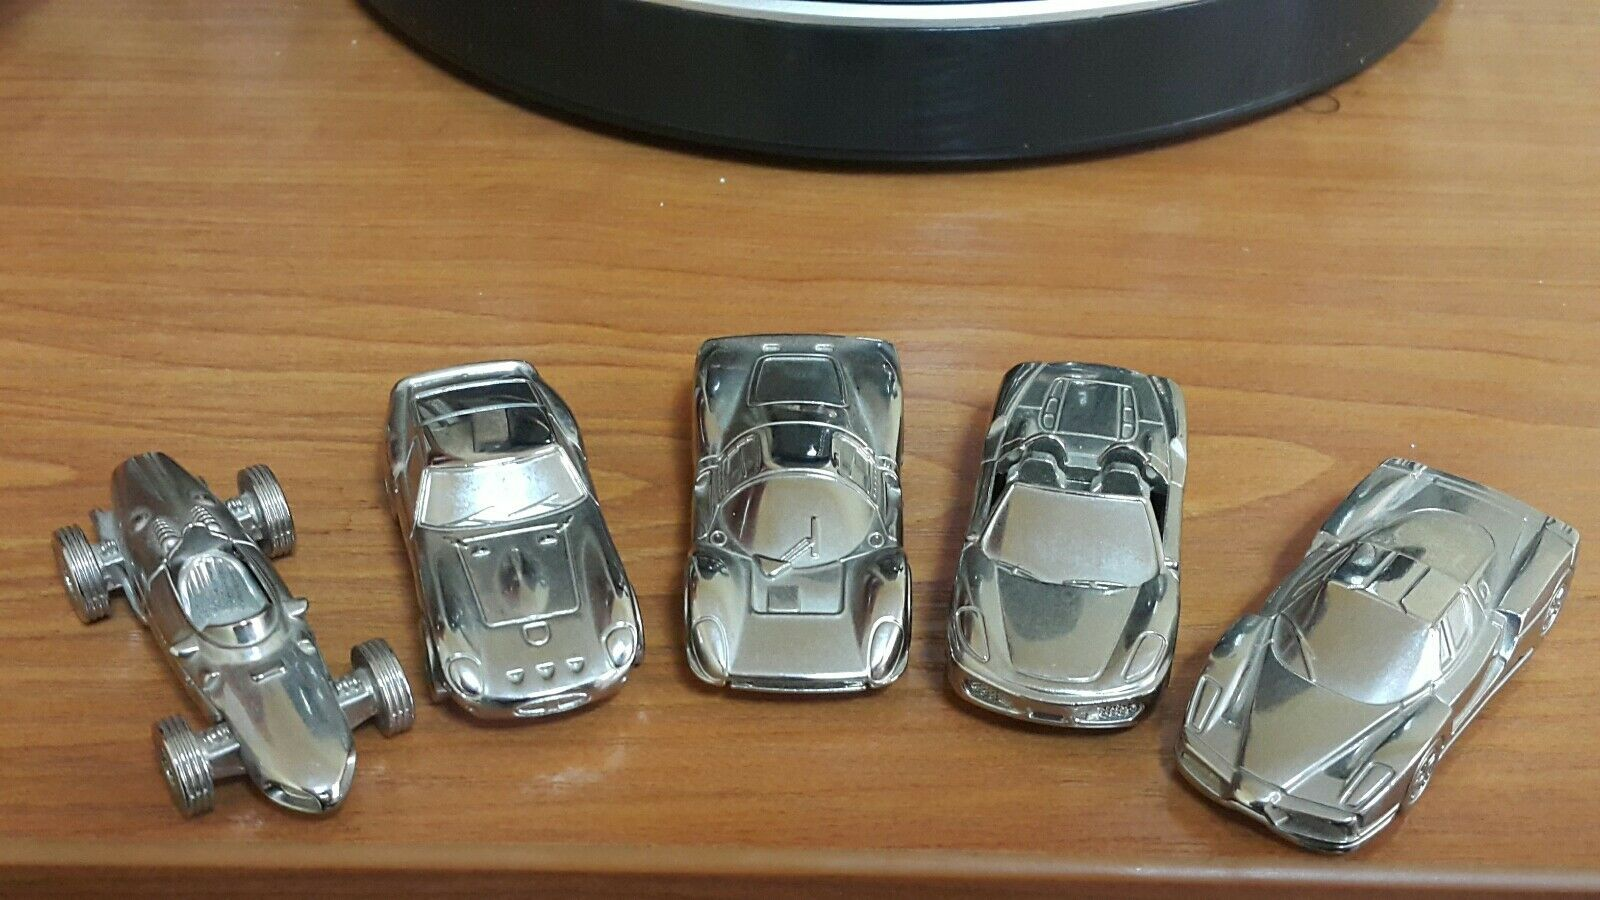 VNTG. ENZO FERRARI F156 GTO S.P.A. MODELS KEYCHAIN TOY PredOTYPE METAL CAR